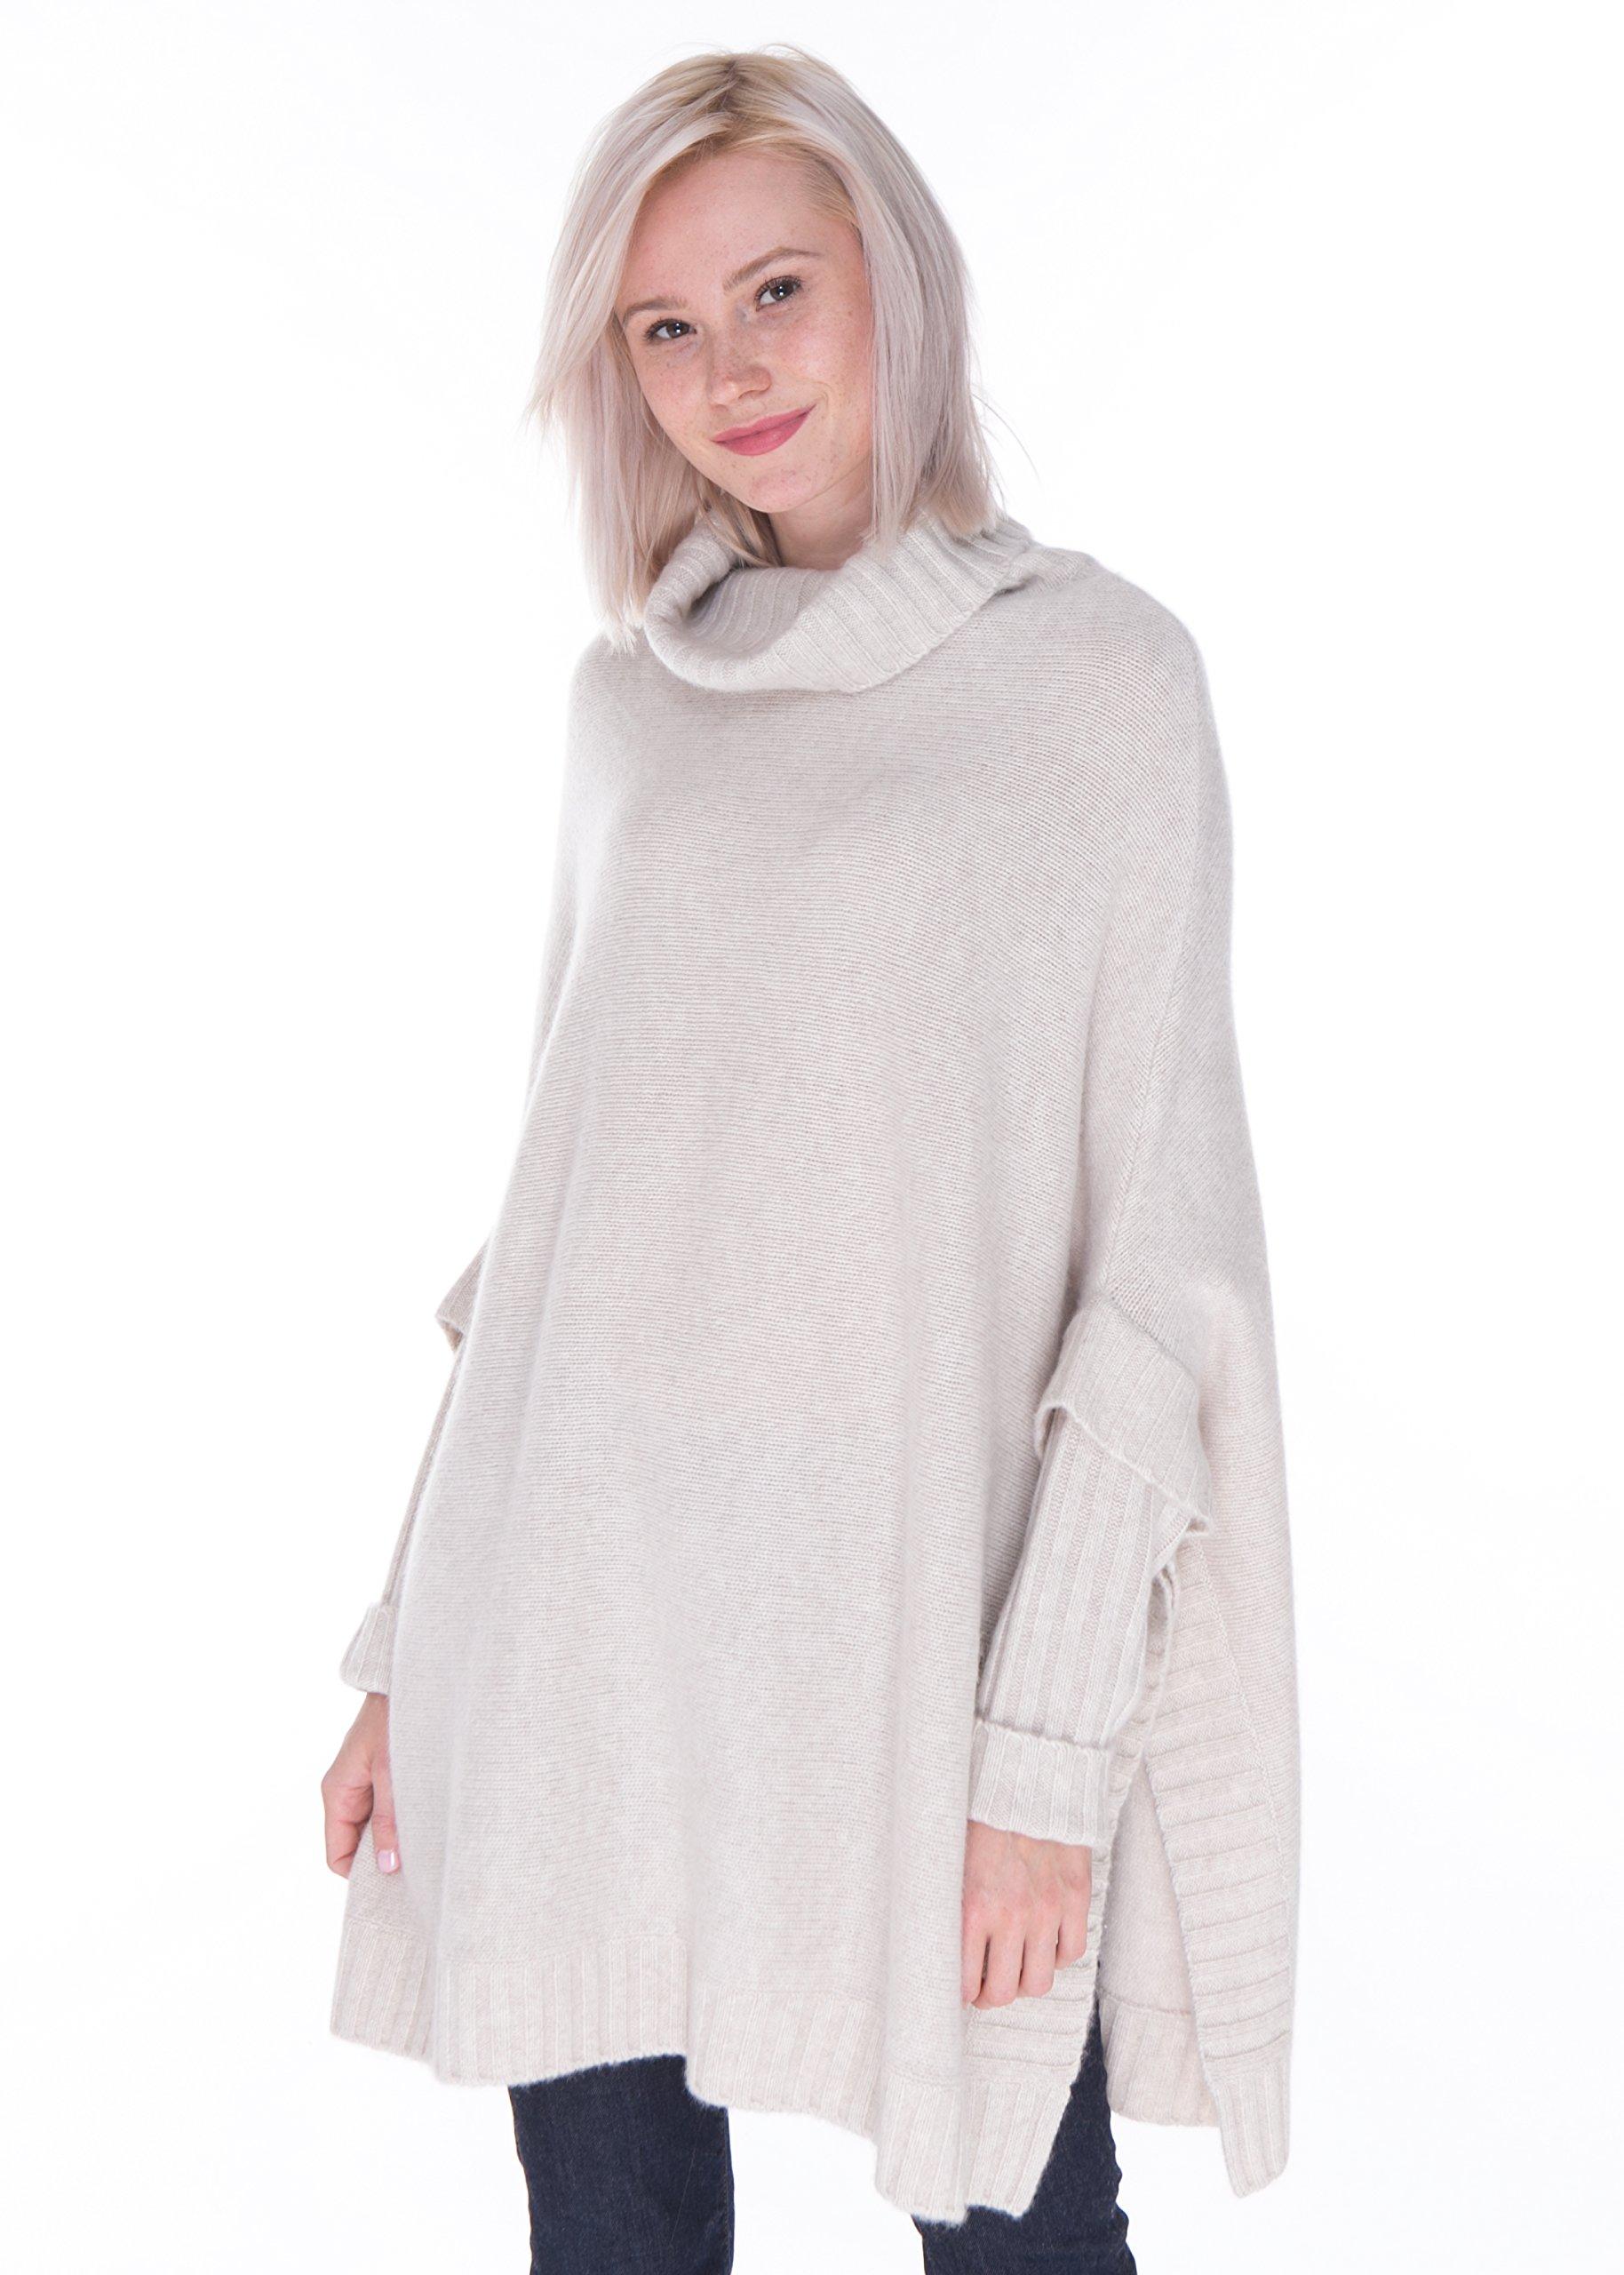 LEBAC women's 100% Cashmere Turtleneck Oversized Poncho Sweater